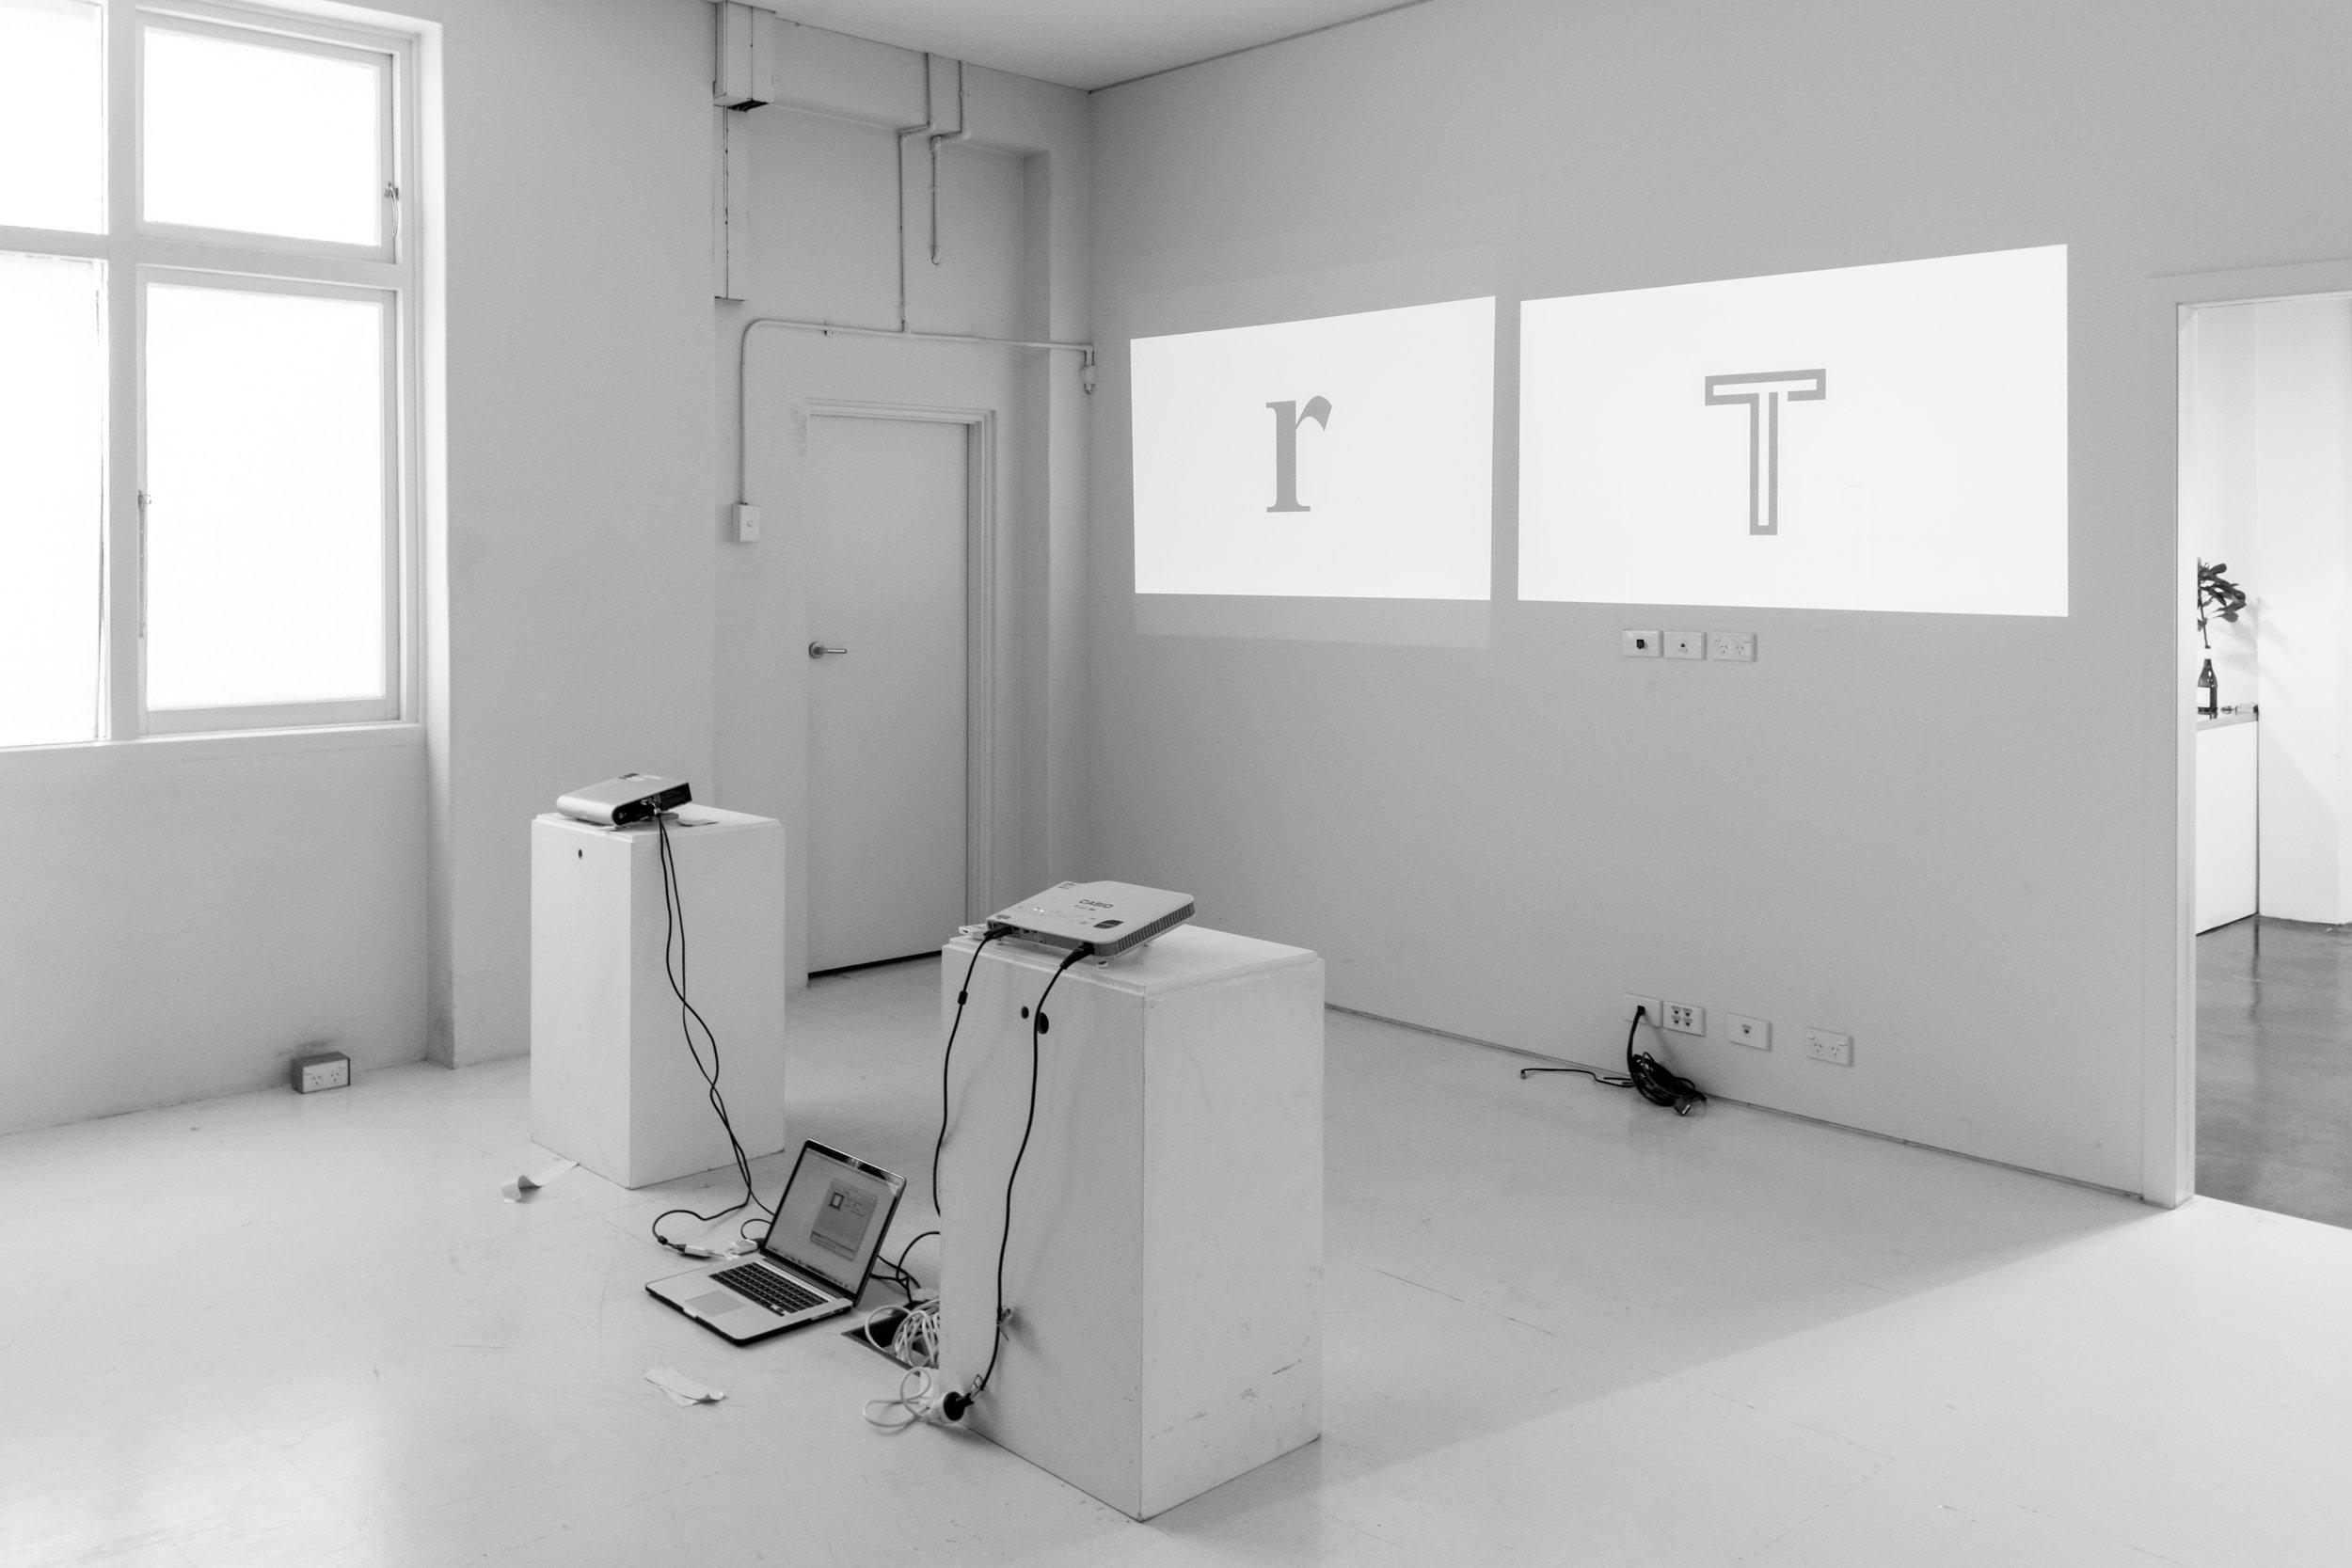 Exhibition-76.jpg